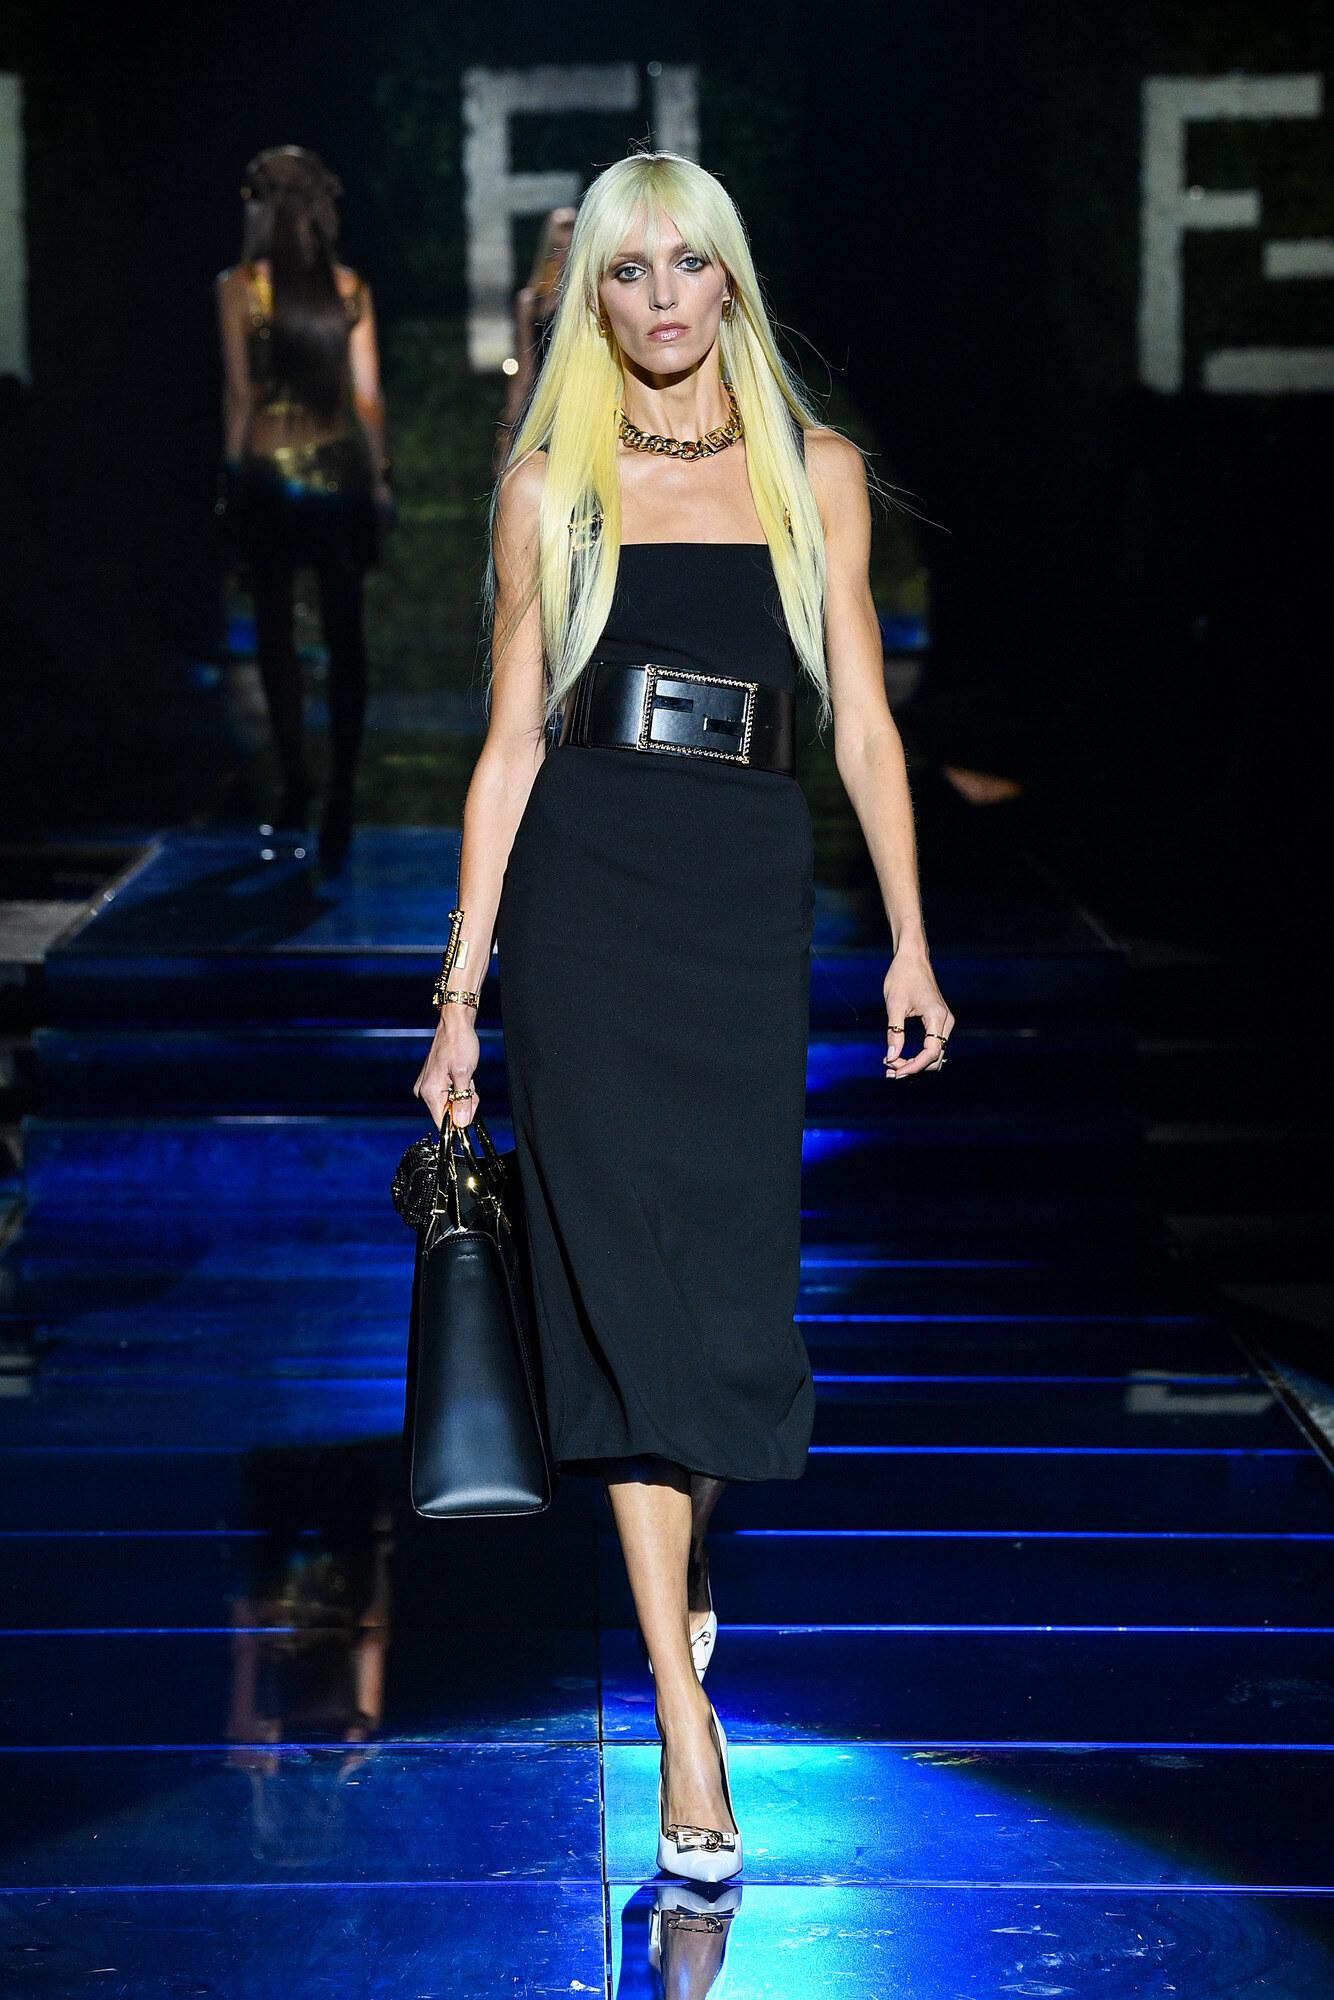 Versace x Fendi Capsule Collection